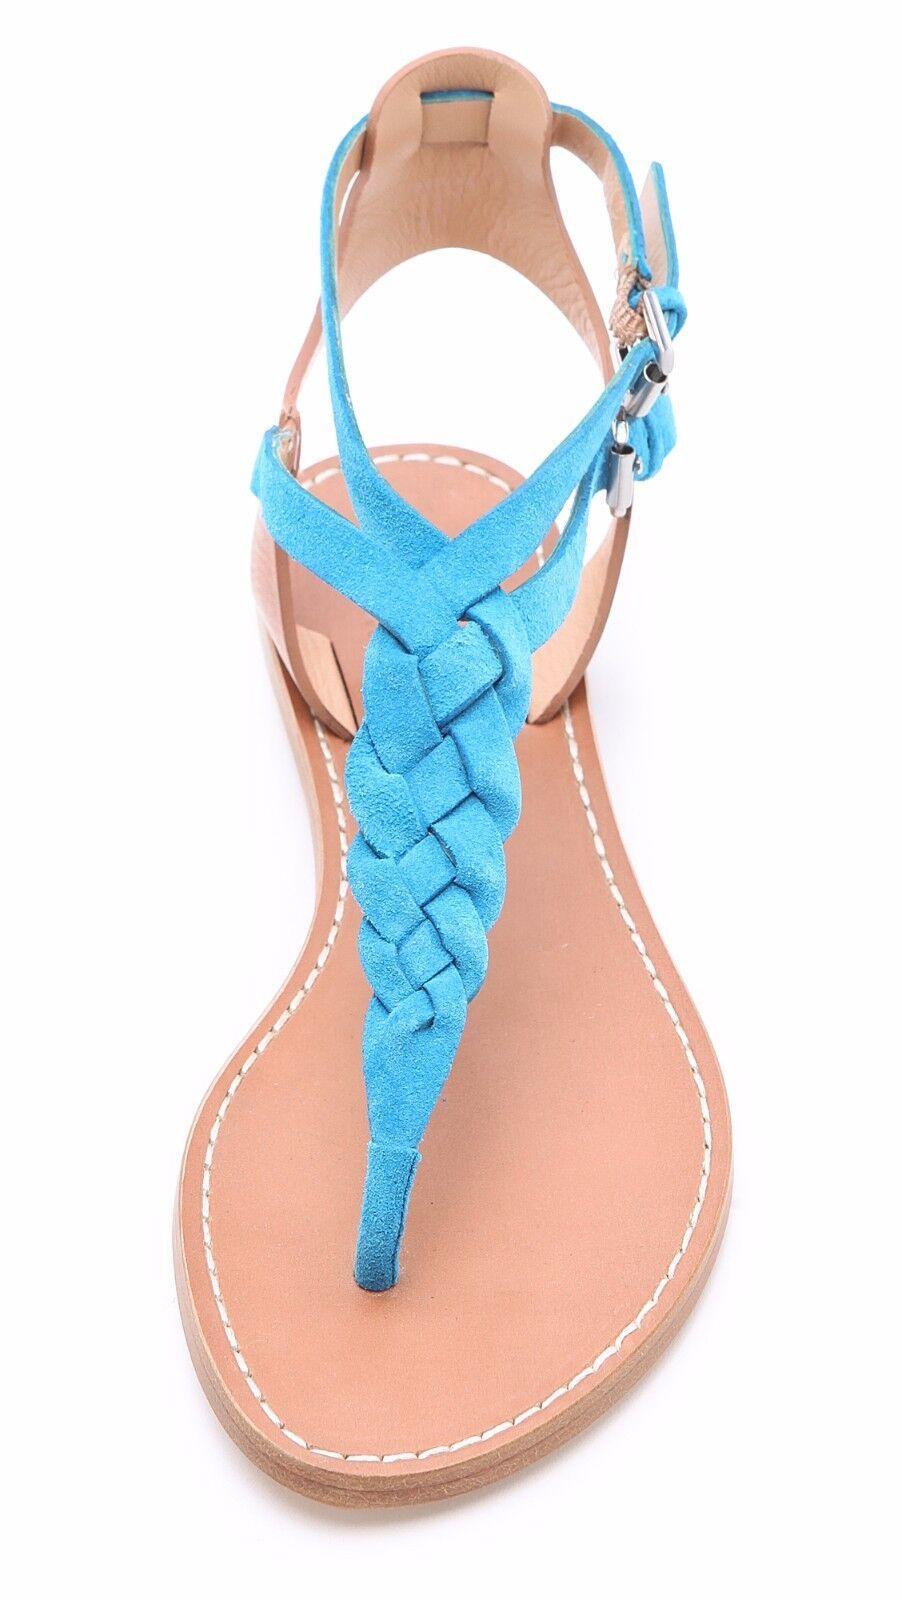 Belle By Sigerson Morrison Suede Sky Blau Rank Braided Suede Morrison T-Strap Sandales Größe 6.5 549a2f